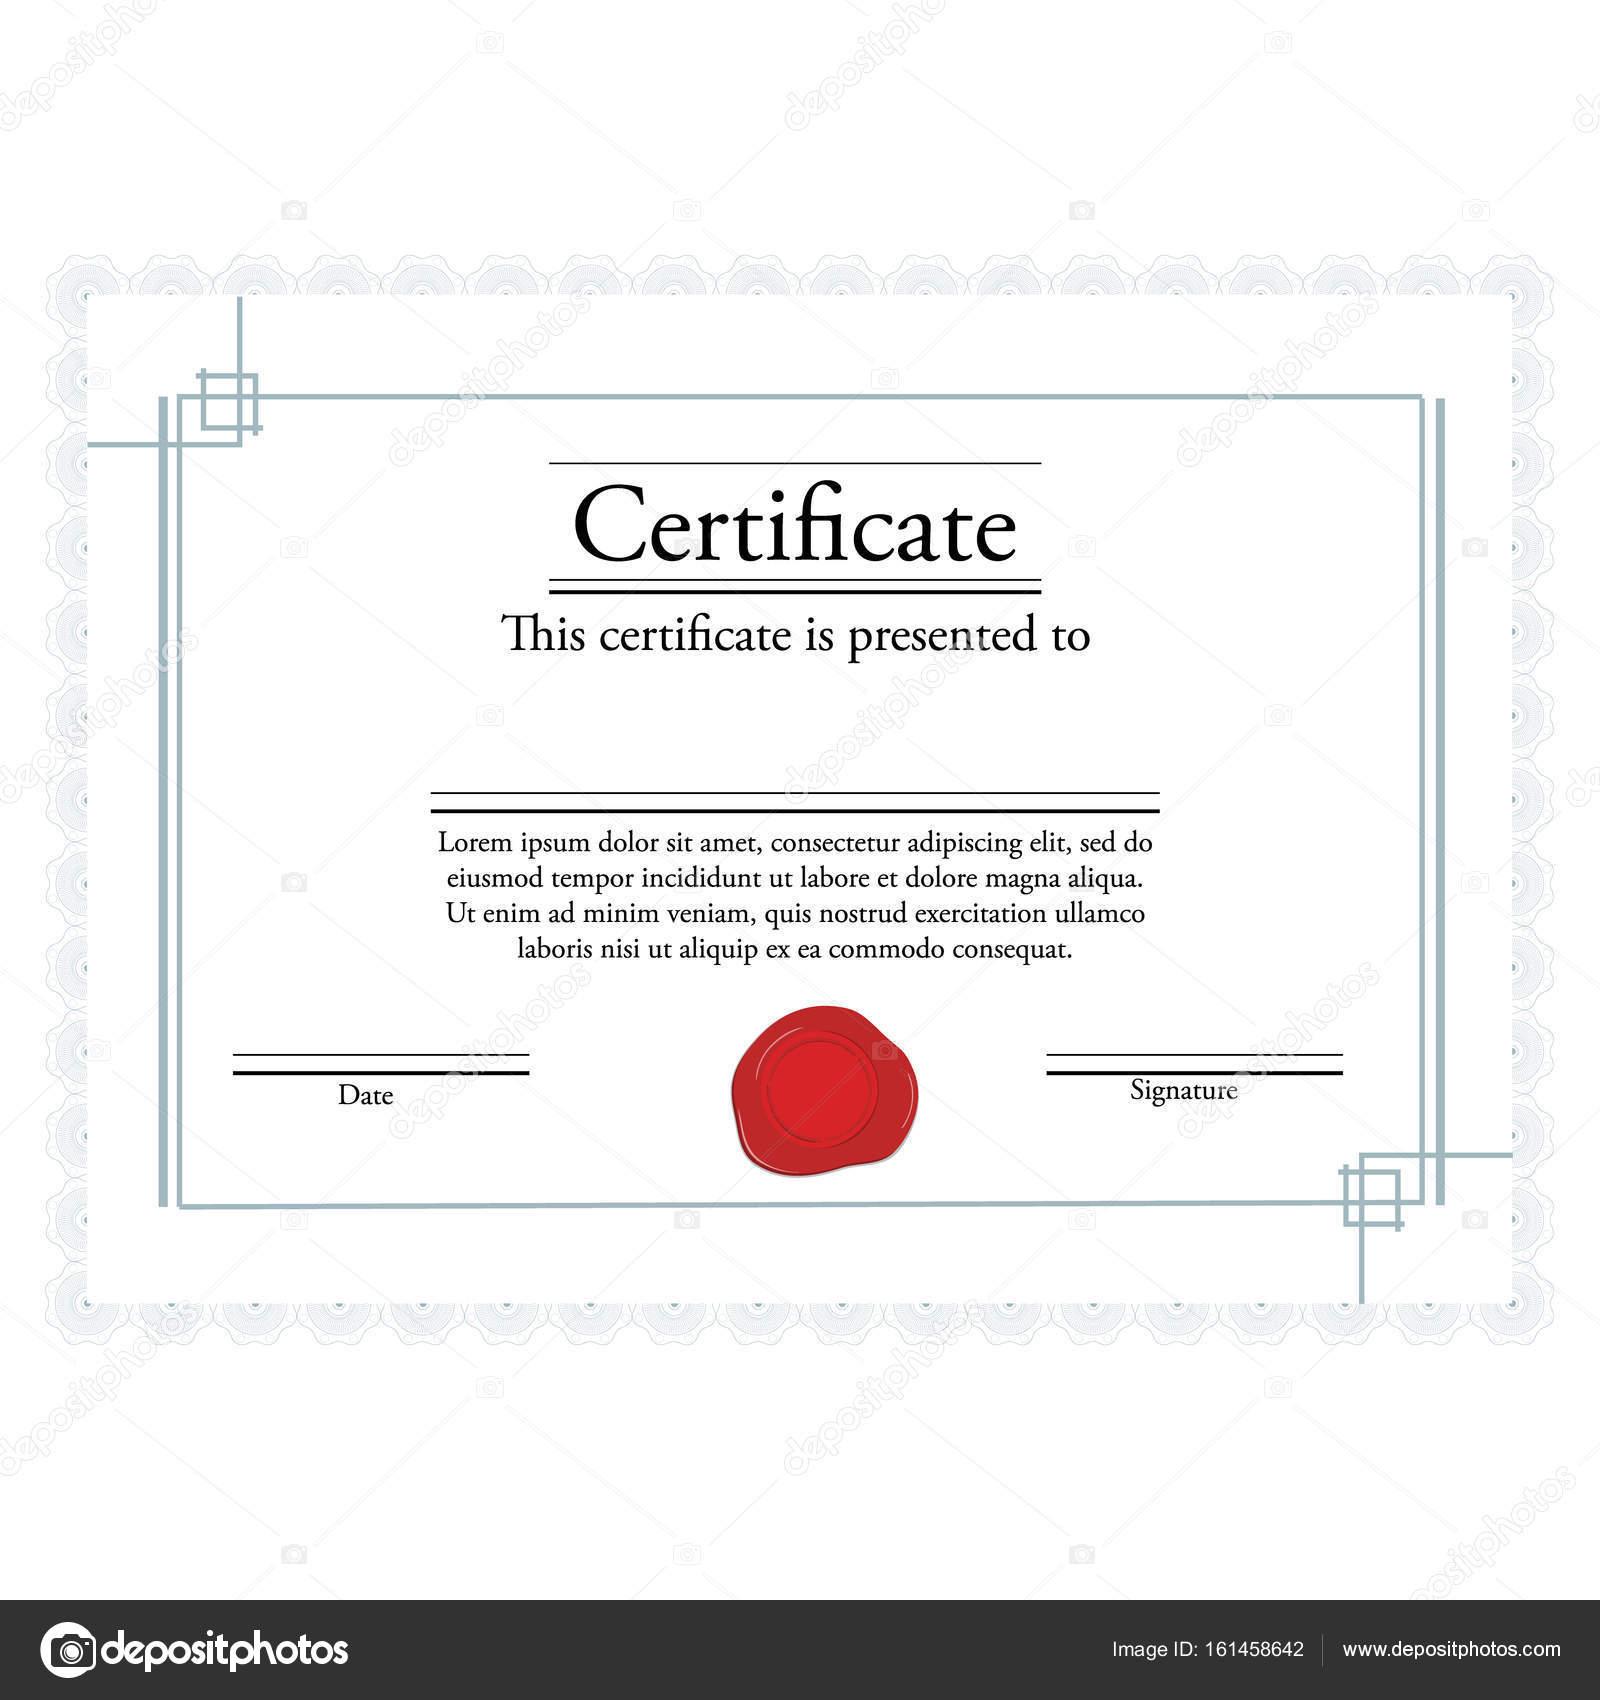 Zertifikat-Vorlage-raster — Stockfoto © viktorijareut #161458642